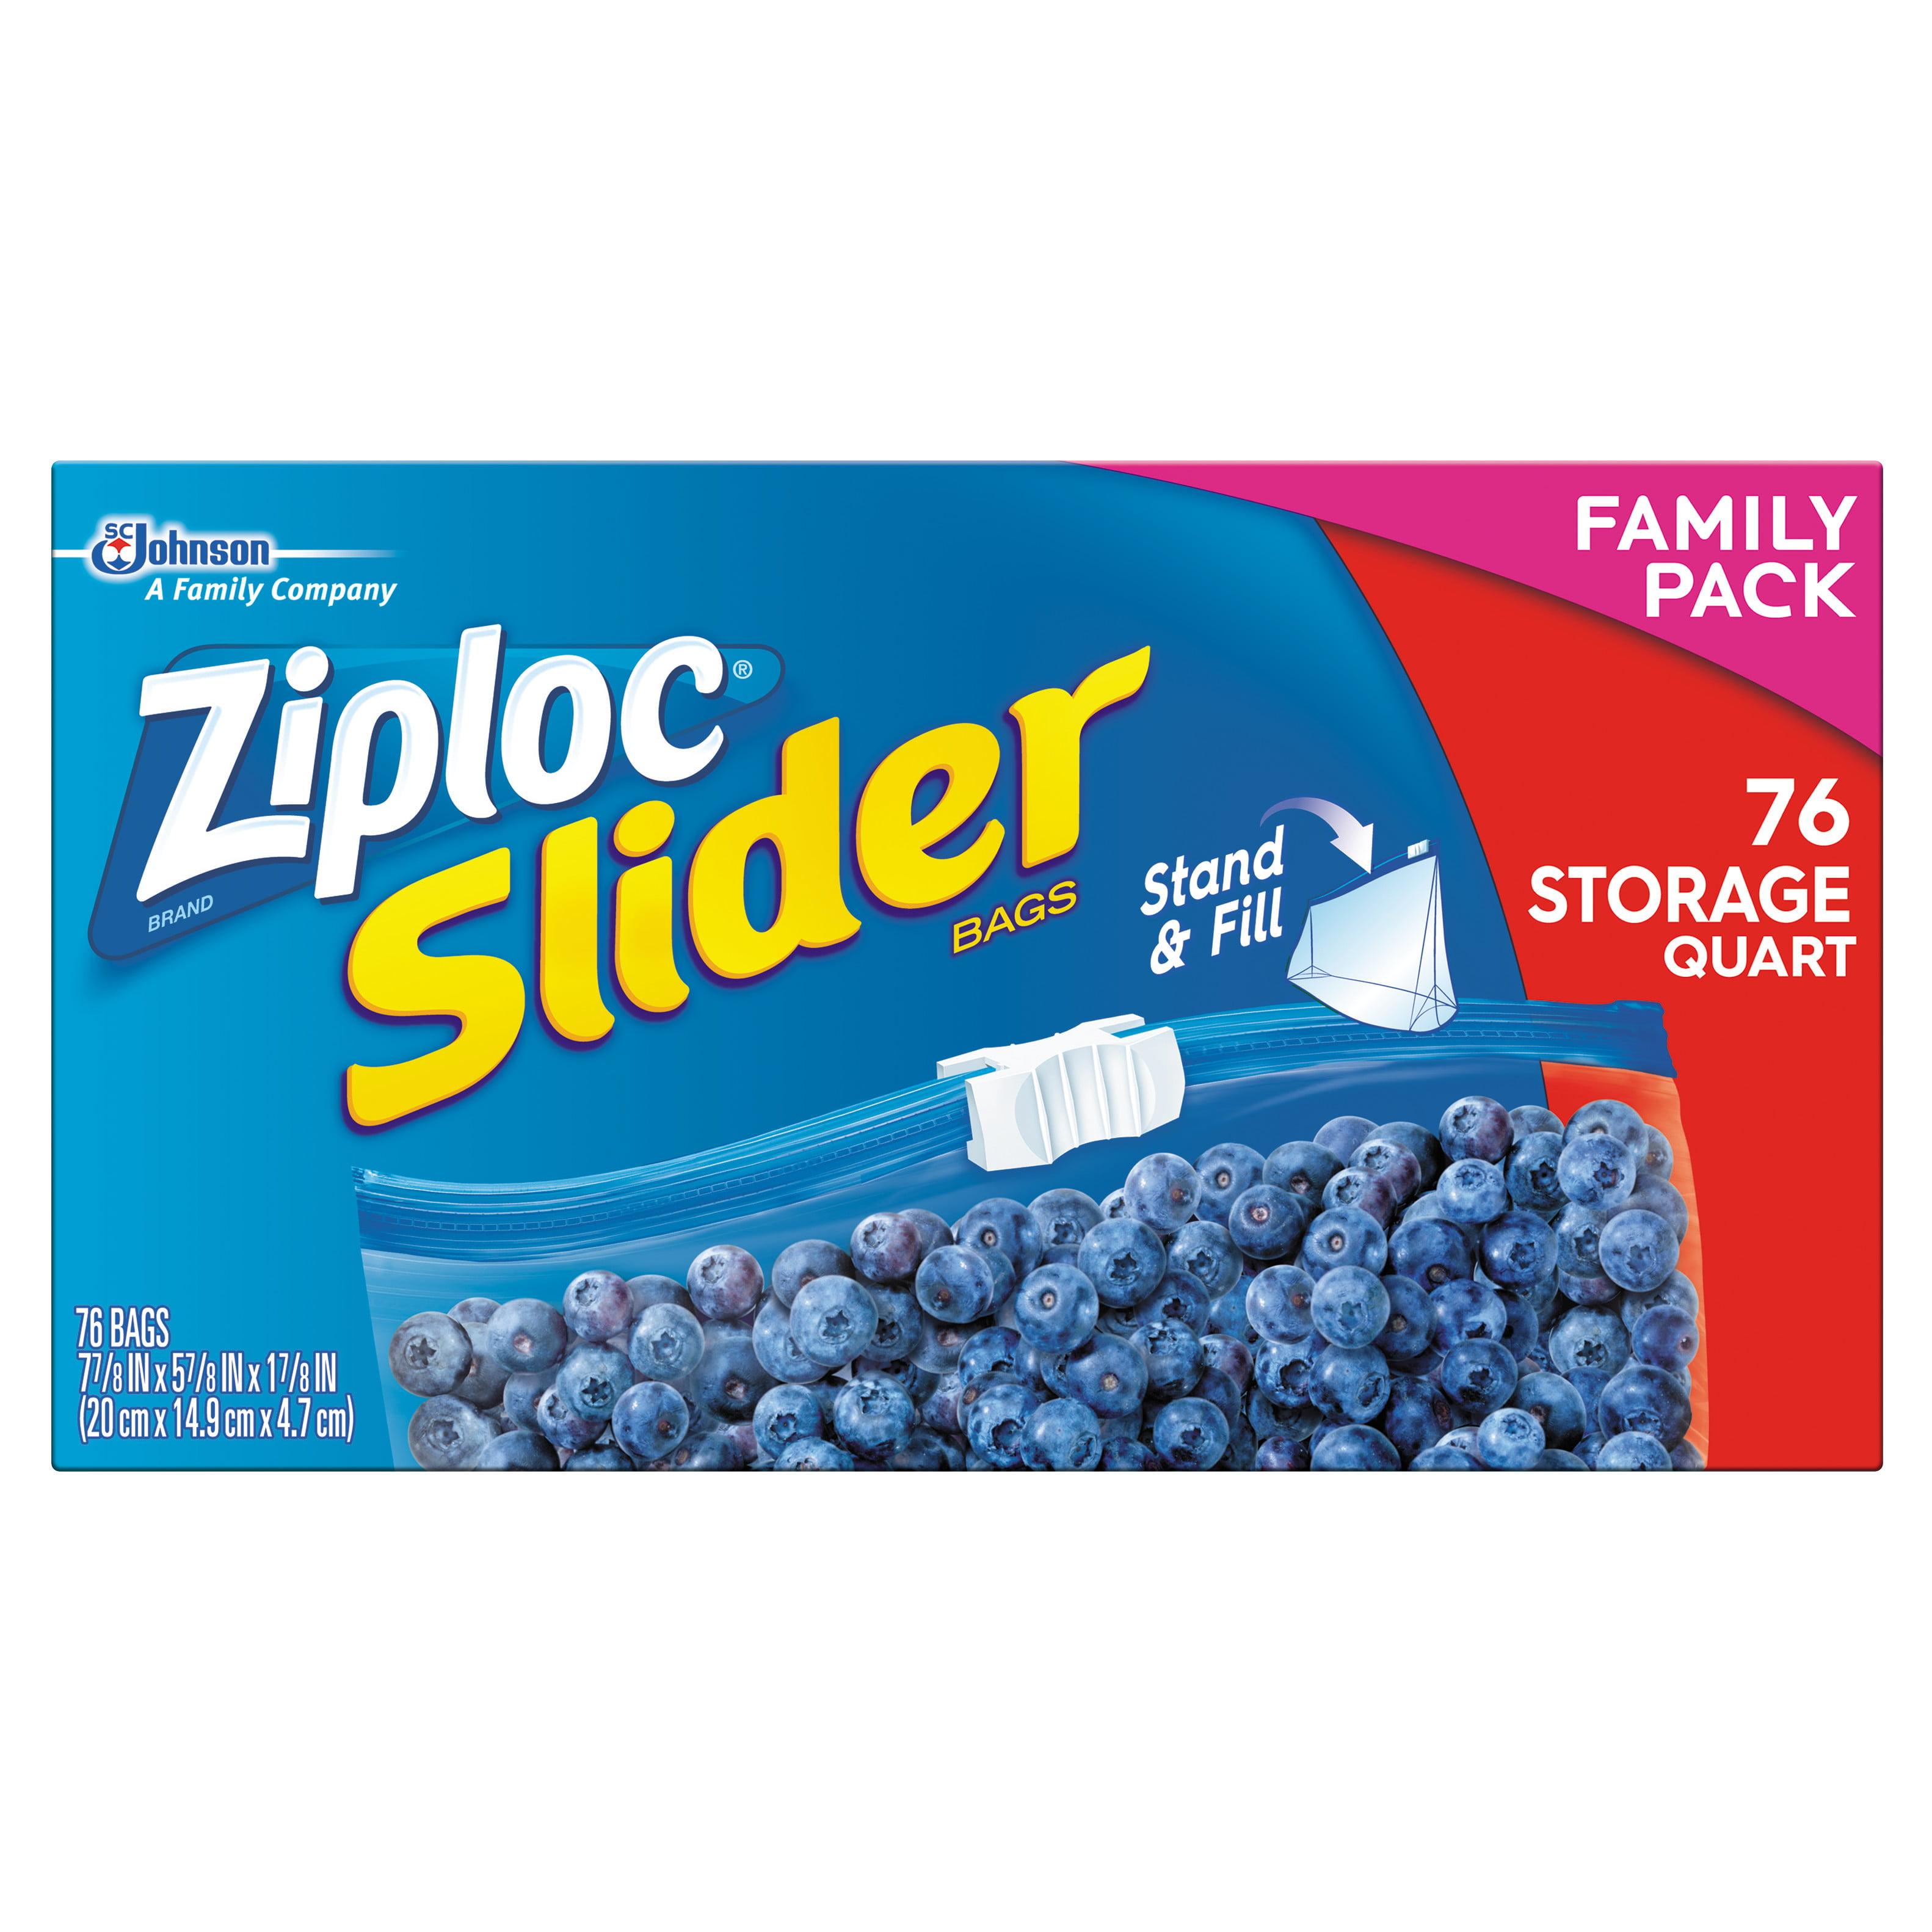 Ziploc Slider Storage Quart Famiy Pack 76 Count